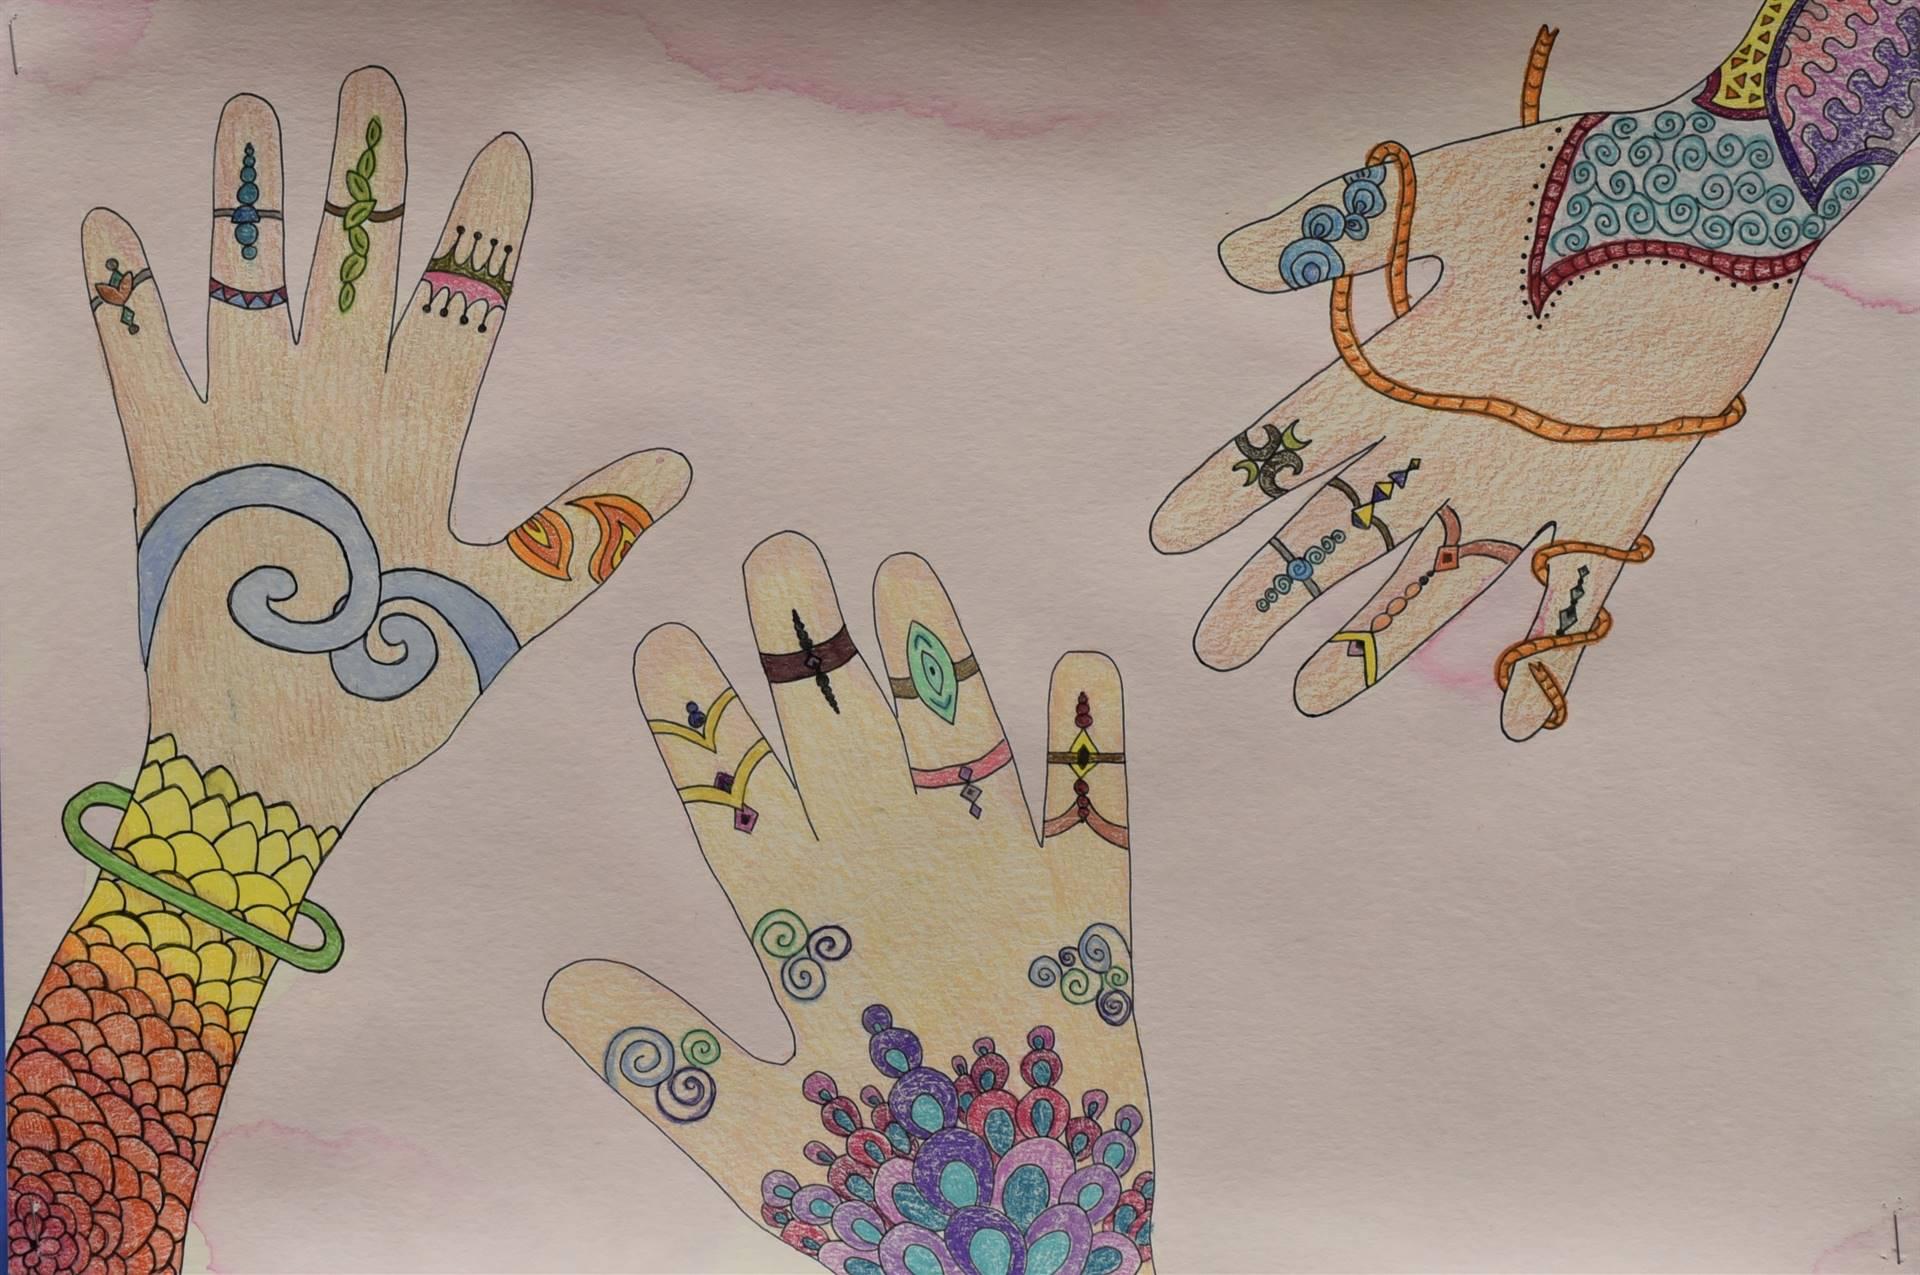 Brecksville-Broadview Hts. Middle School Art Projects 53